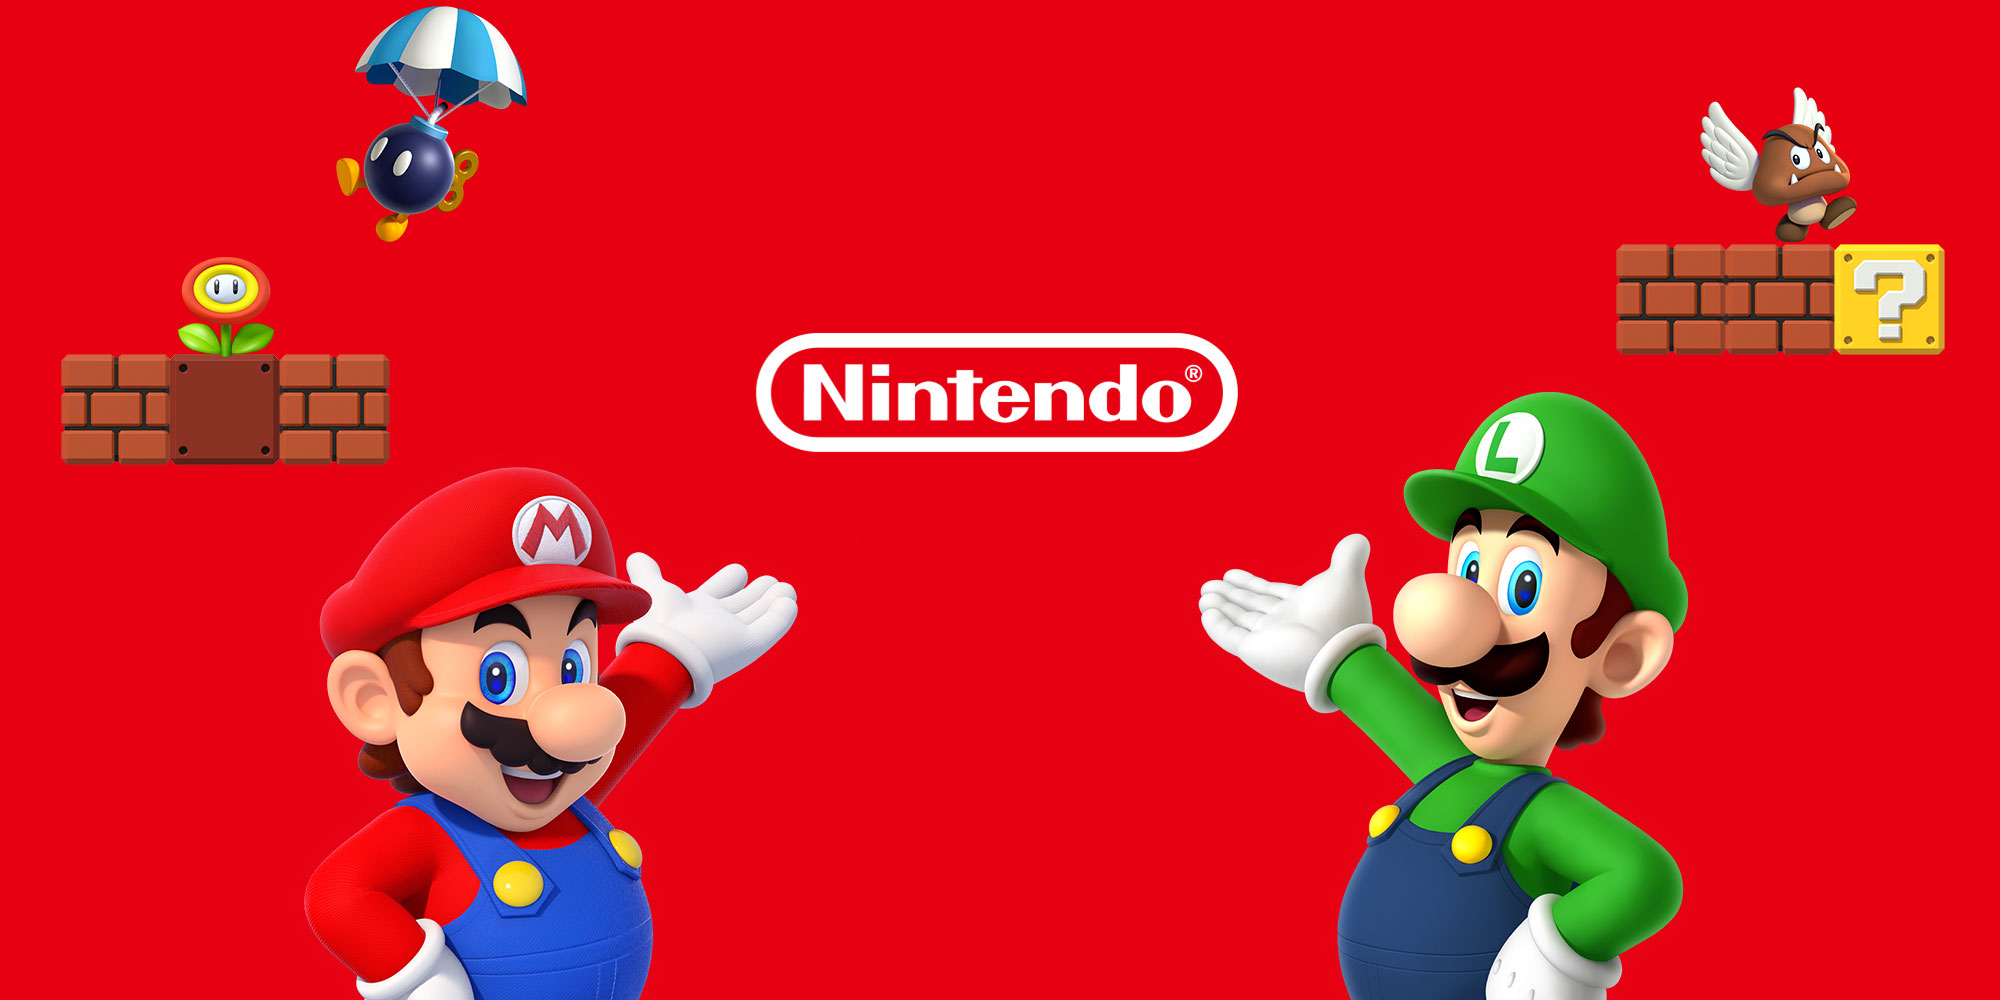 Nintendo: Tonight livestream with new Switch games